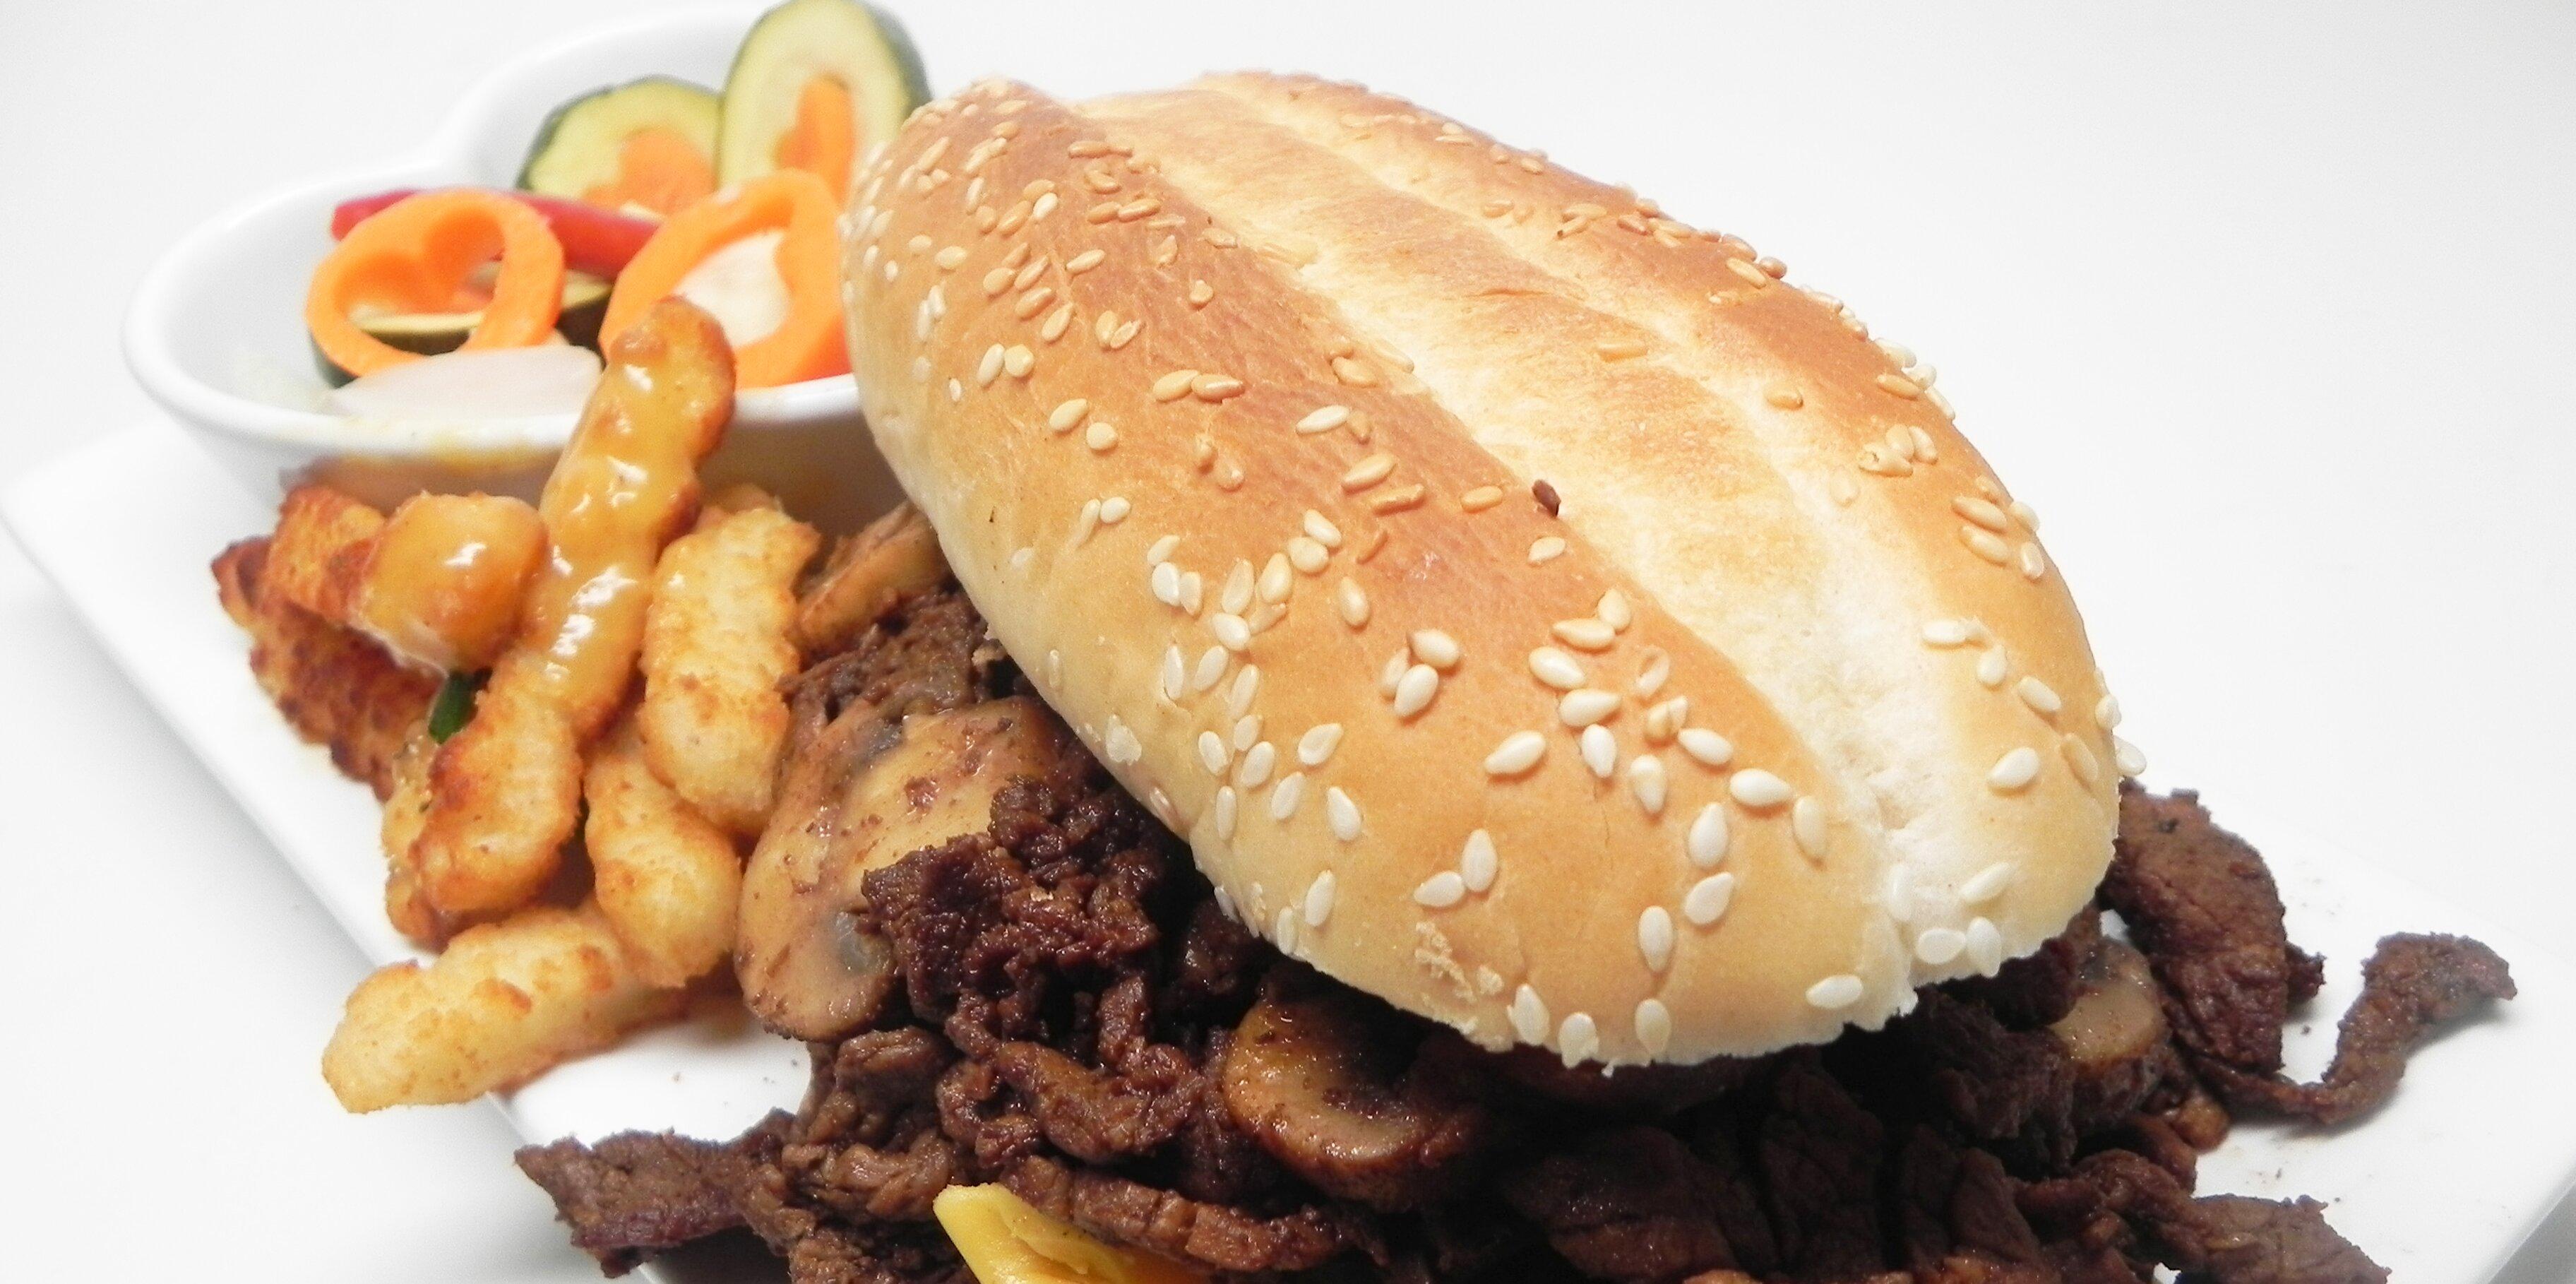 coreys steak cheese and mushroom subs recipe